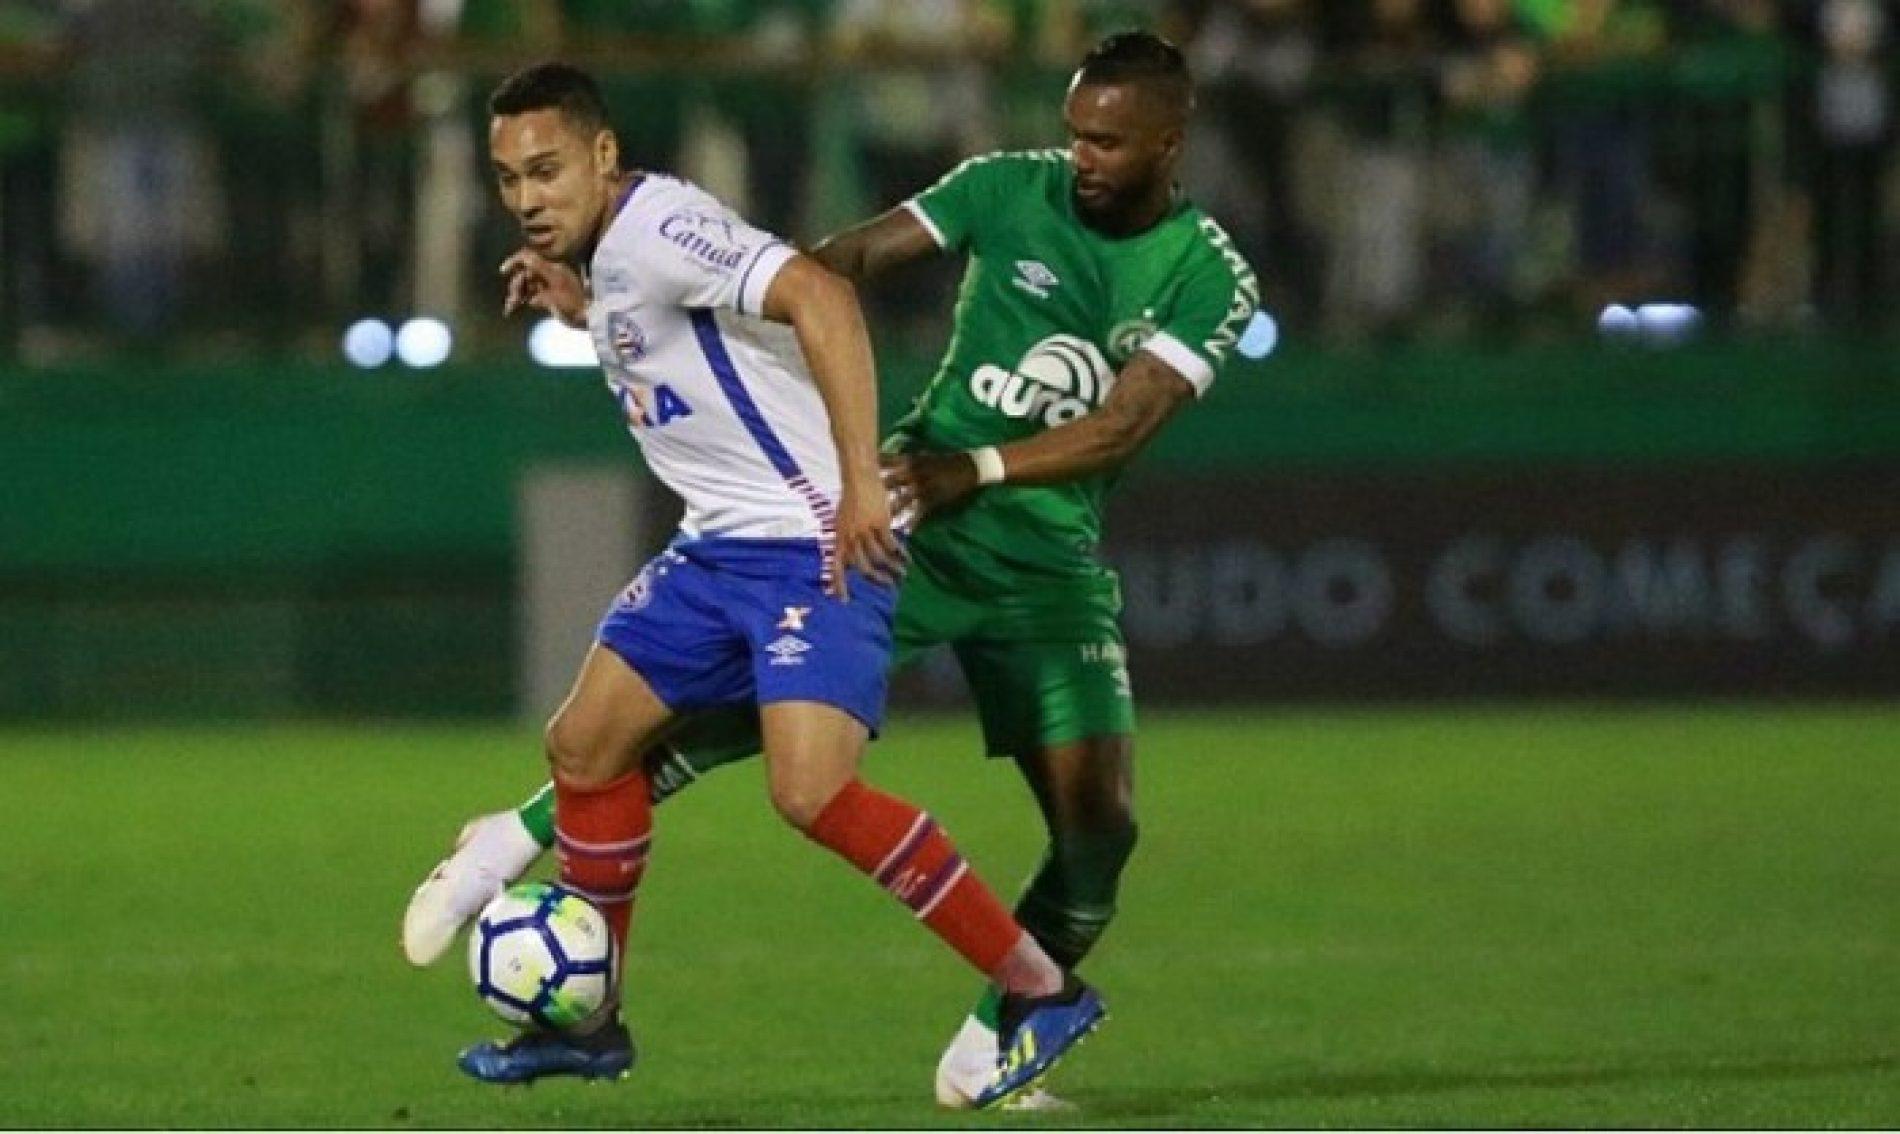 Bahia empata com a Chapecoense e segue na zona de rebaixamento do Campeonato Brasileiro